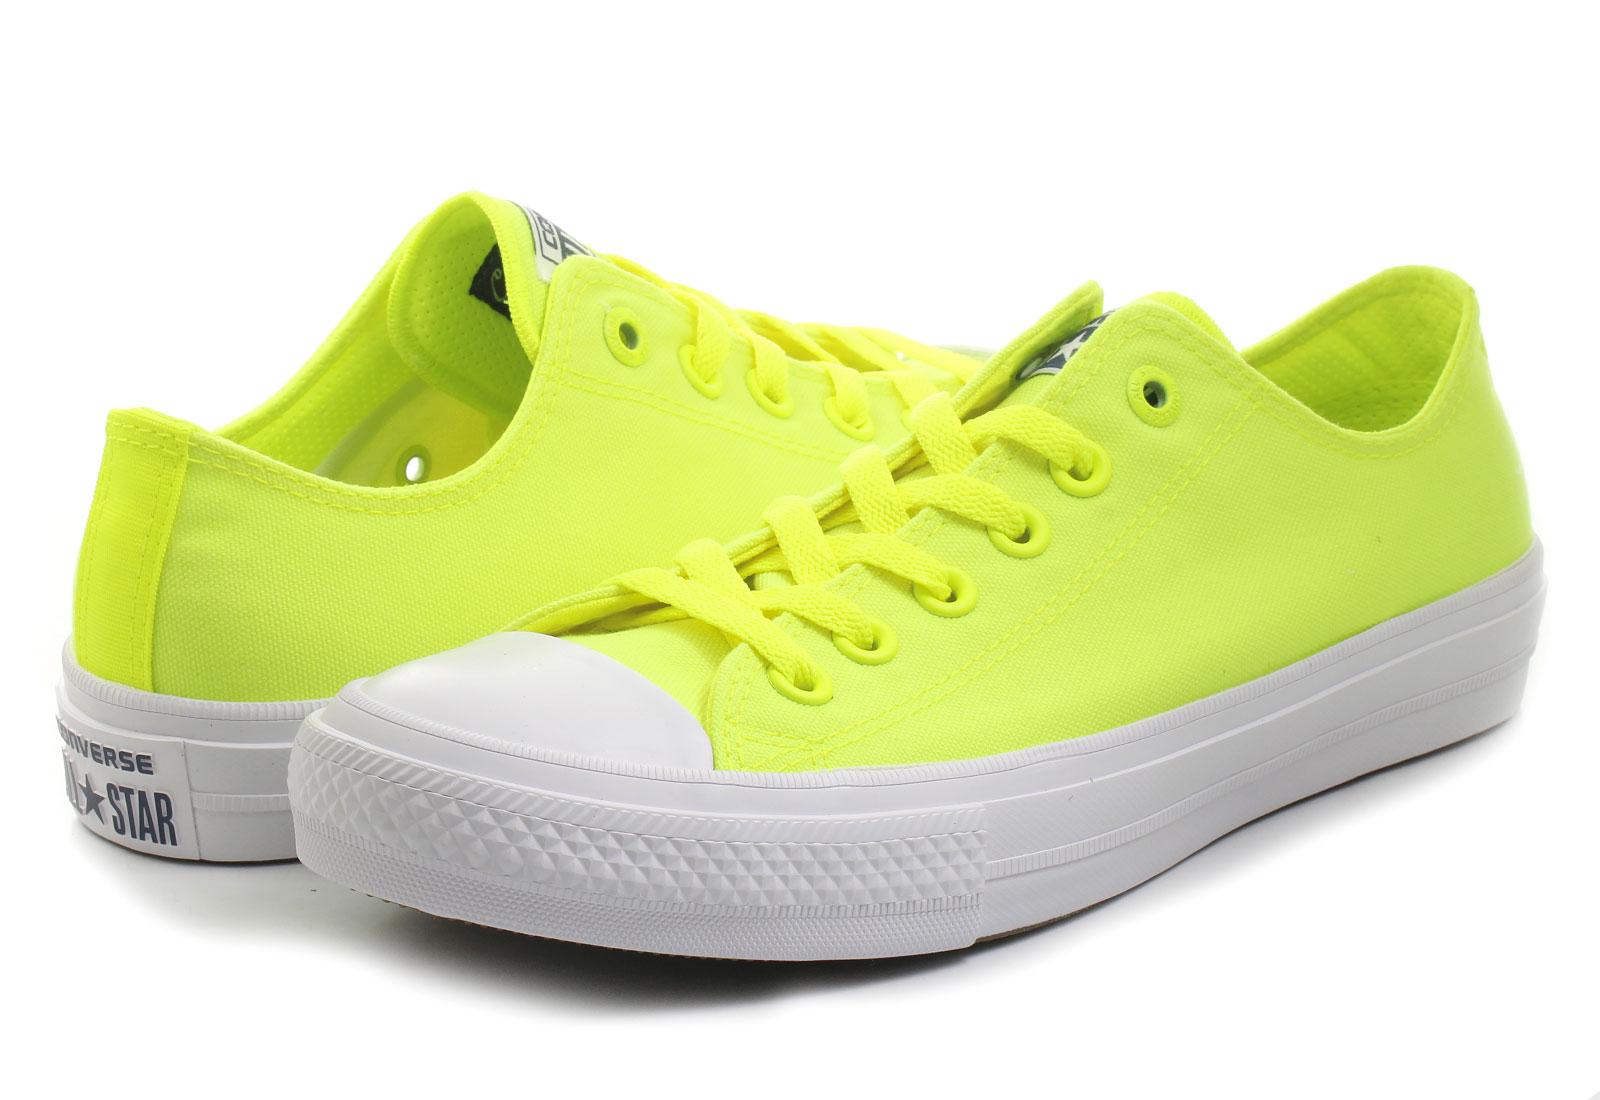 7d4ea5642d8 Converse Niske Tenisice Zelene Tenisice - Chuck Taylor All Star II Ox -  Office Shoes - Online trgovina obuće